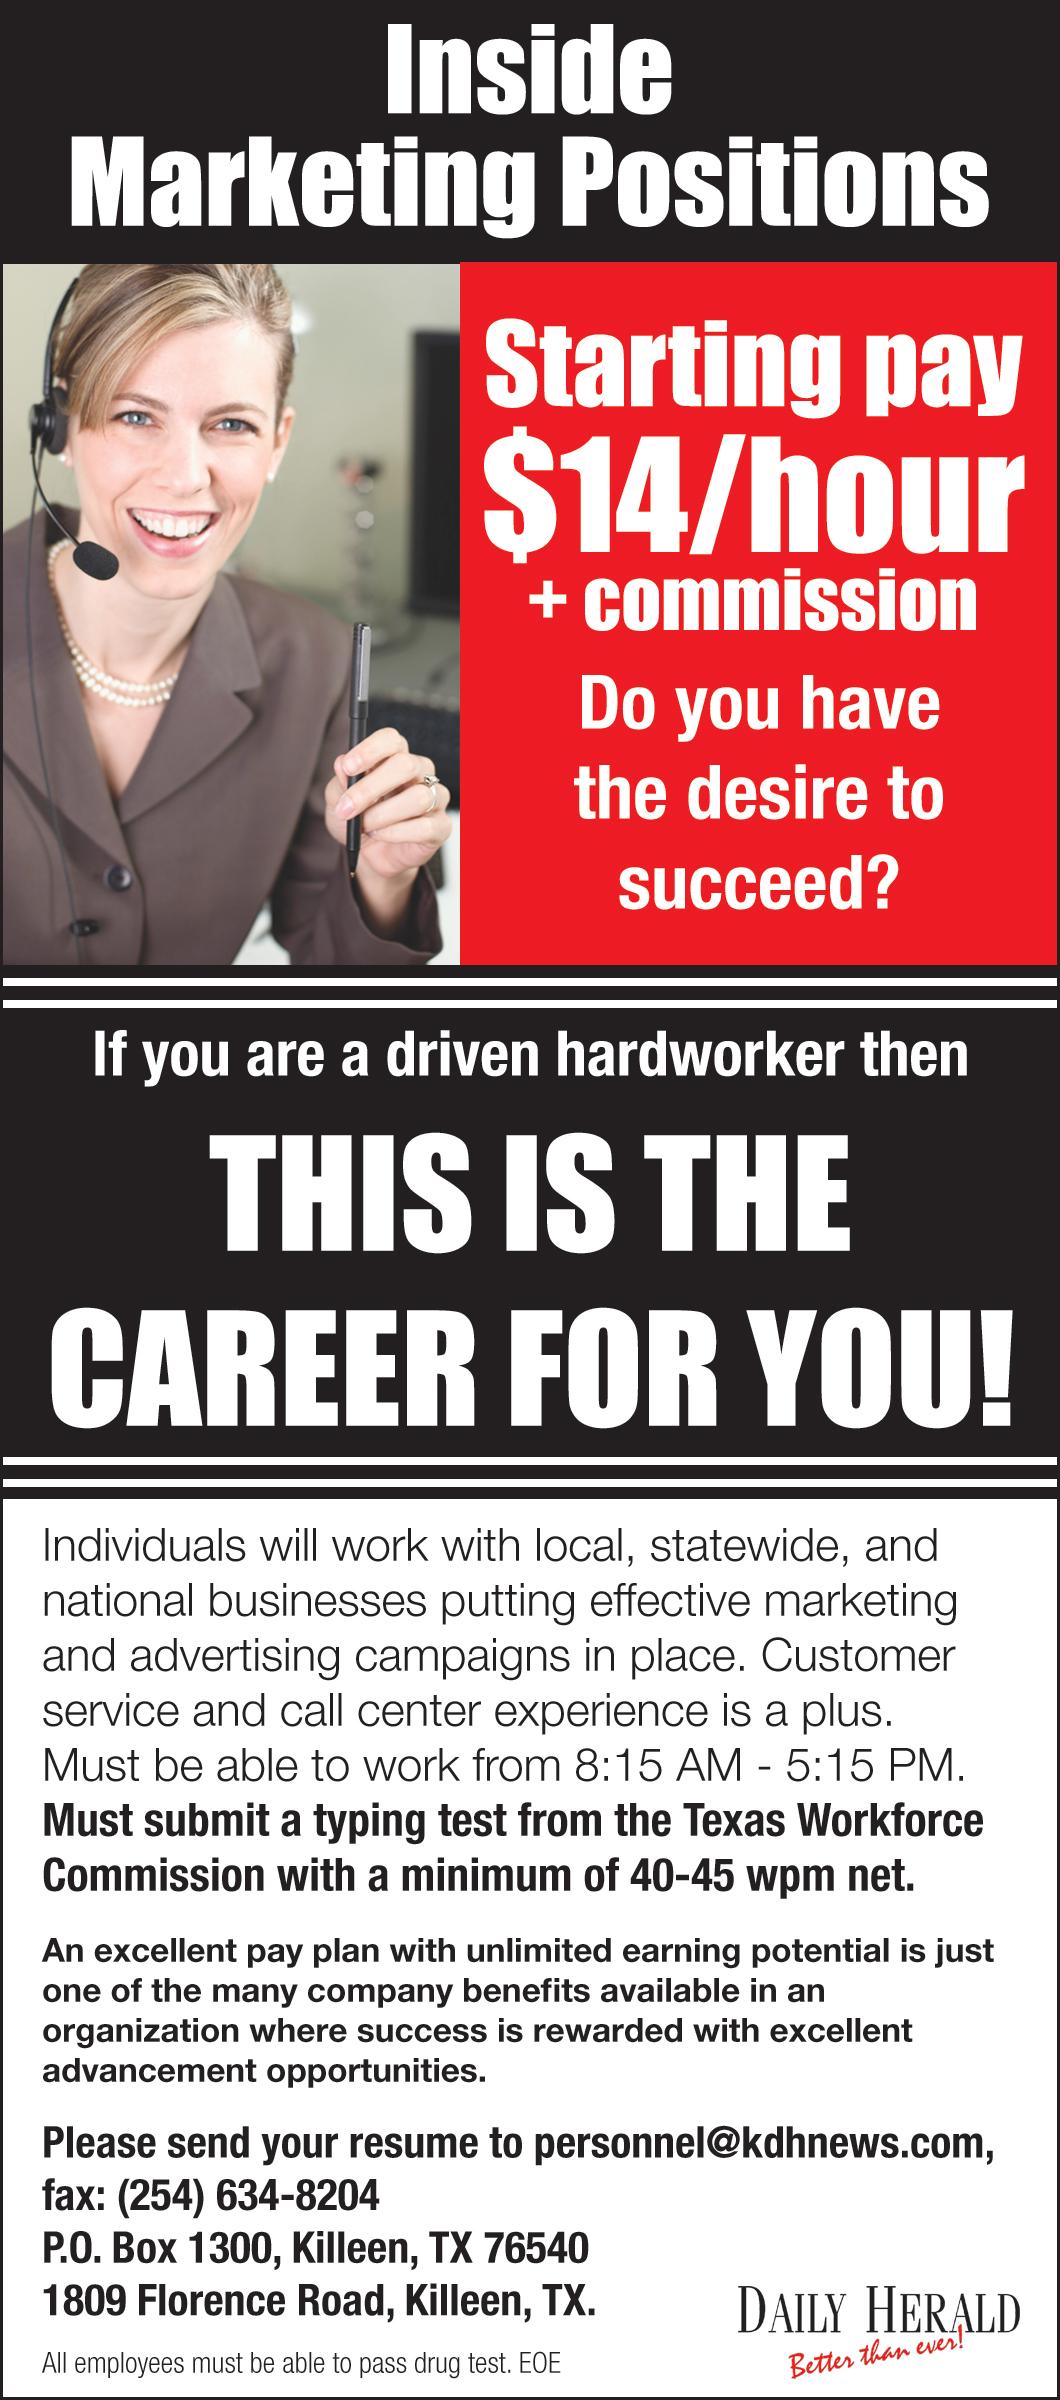 Inside Marketing Positions